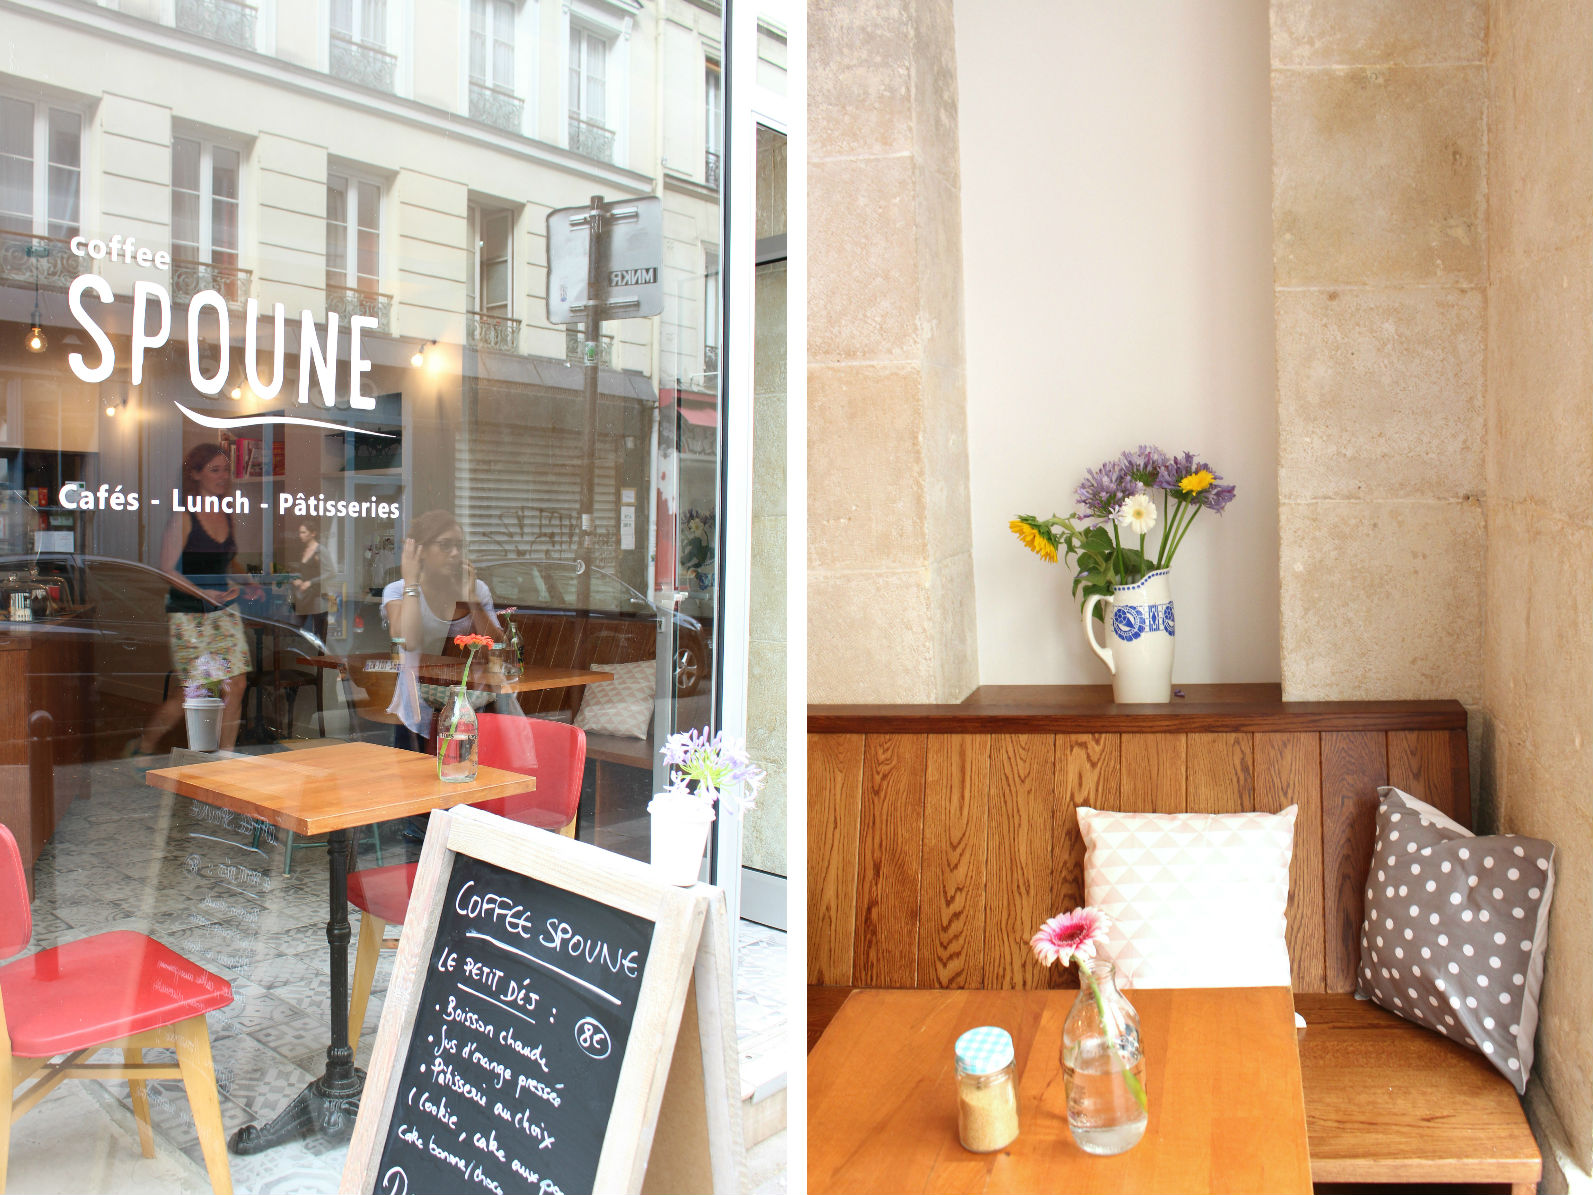 HiP Paris blog. Coffee Spoune. Adorable entrance, cozy seating.